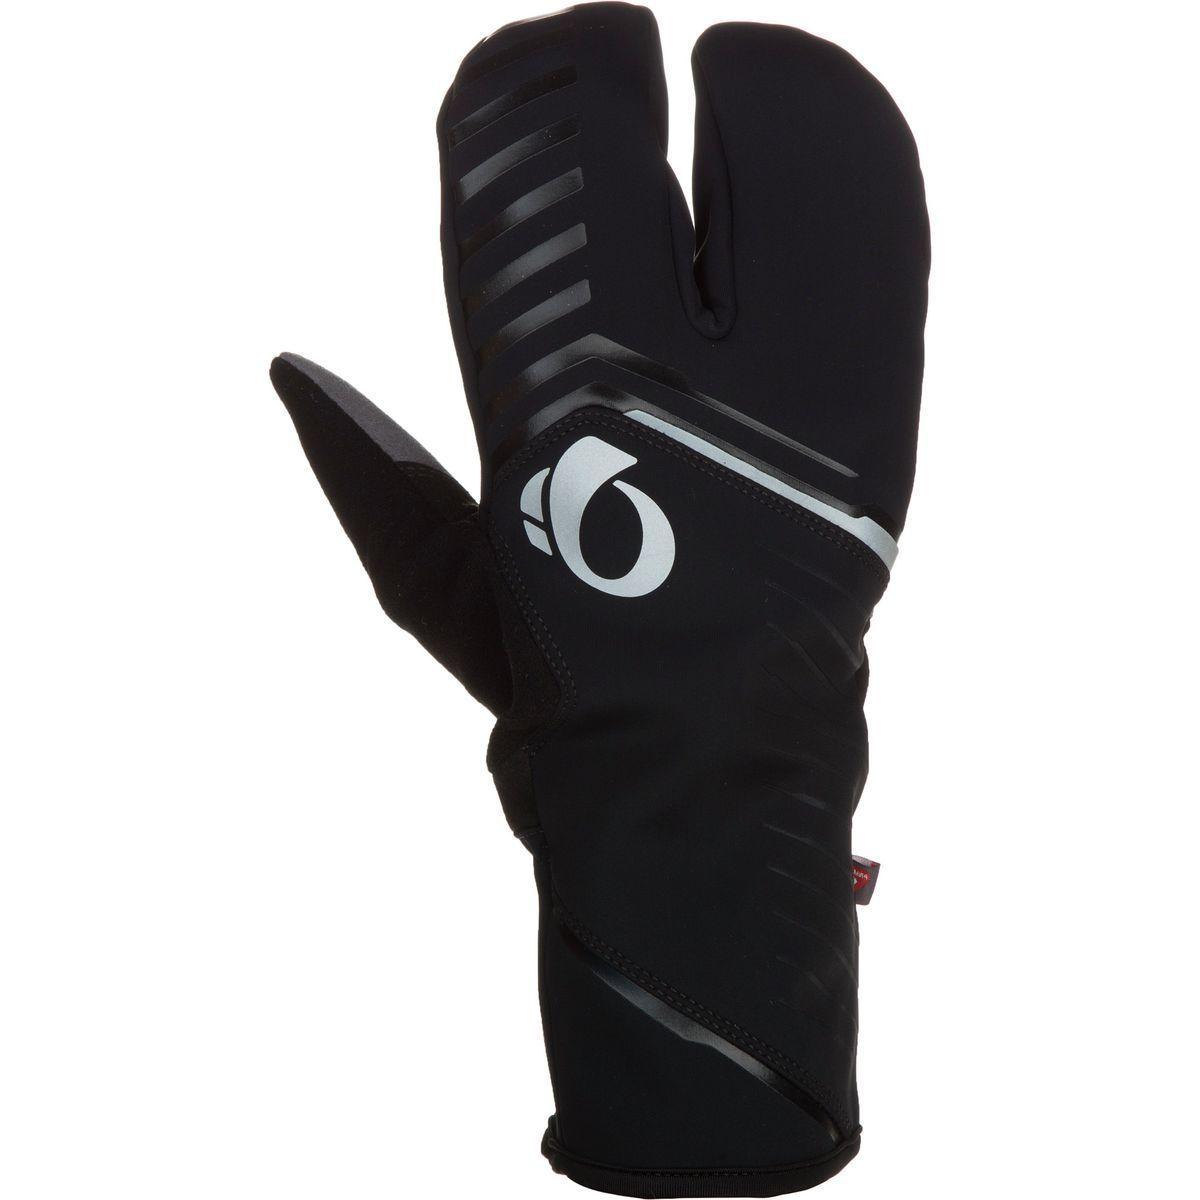 Pearl Izumi P.R.O. AmFIB Lobster Glove - Men's